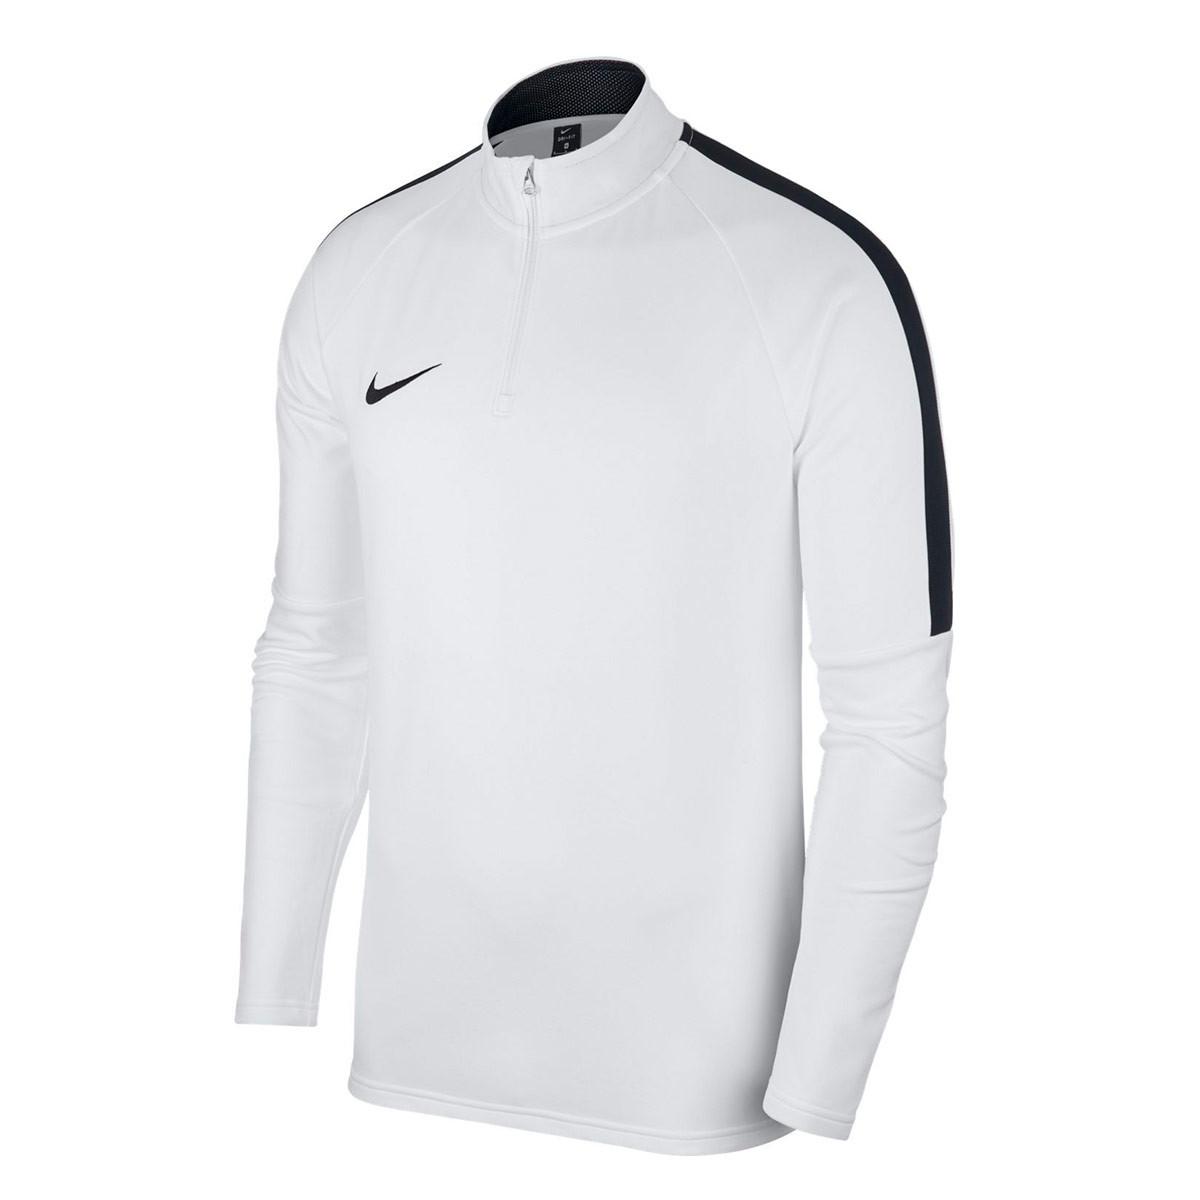 5eff4b66979b Sweatshirt Nike Kids Academy 18 Drill White-Black-Black - Tienda de fútbol  Fútbol Emotion